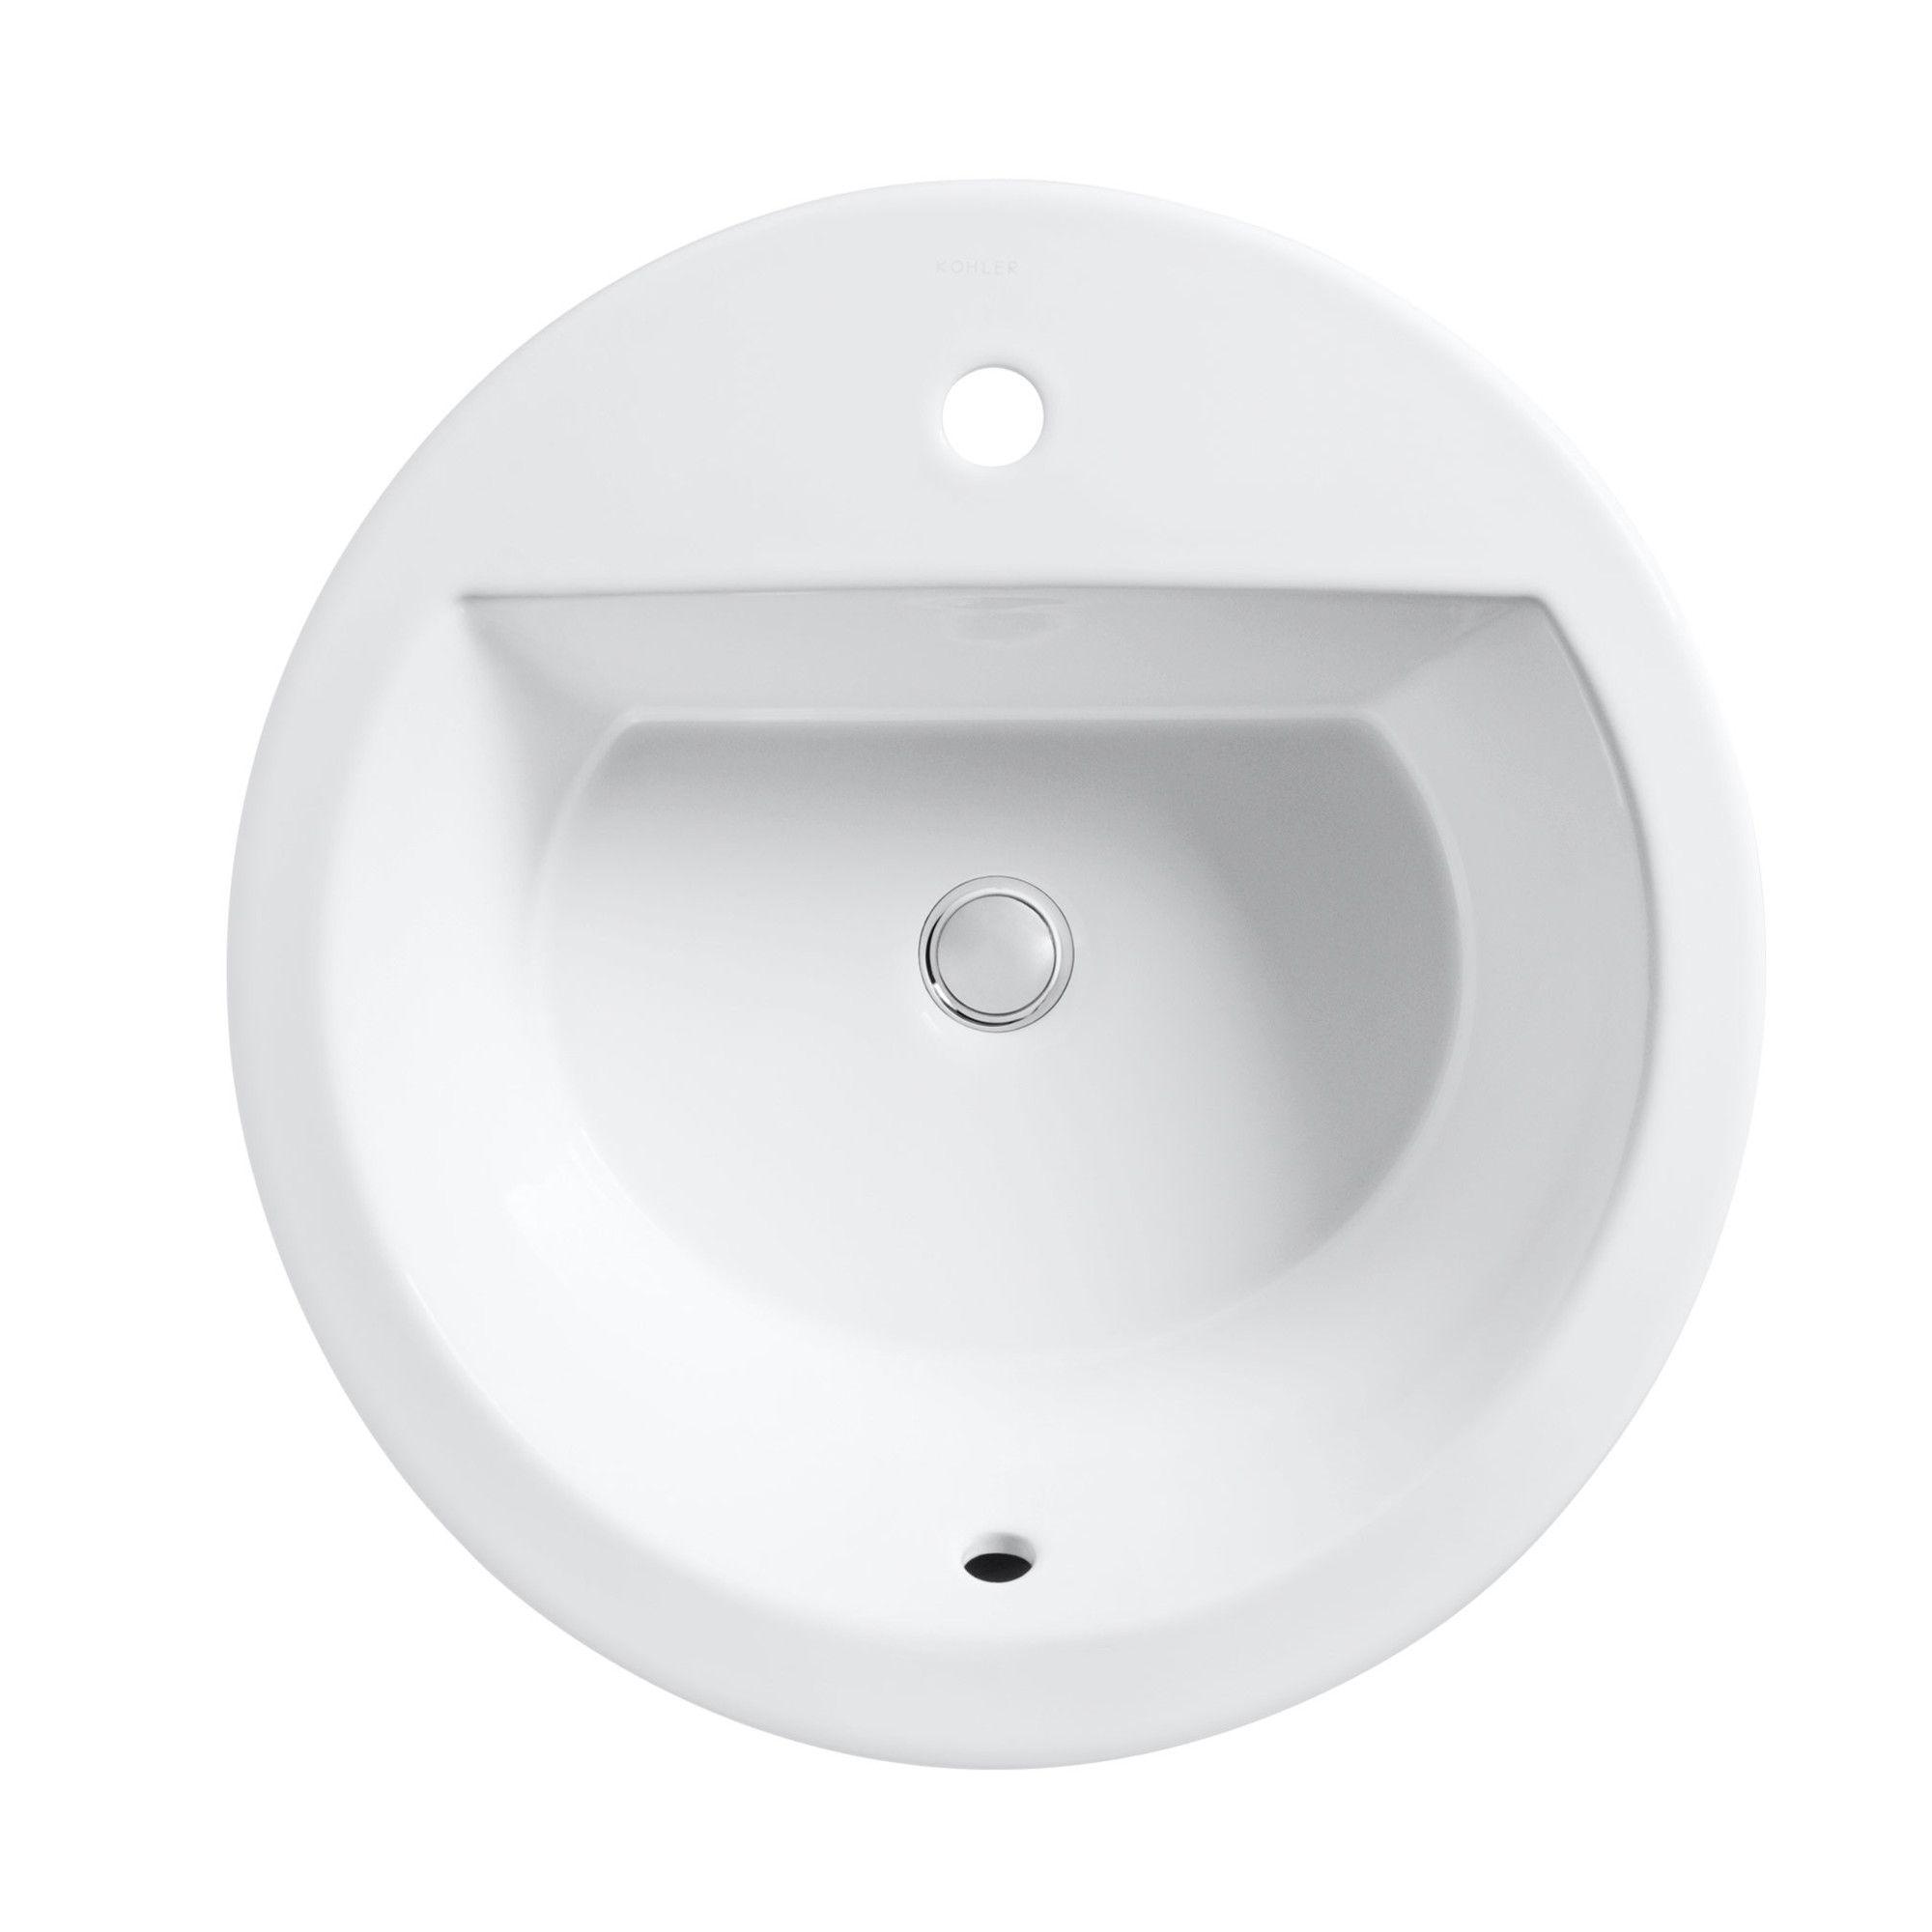 Bryant Ceramic Circular Drop In Bathroom Sink With Overflow Drop